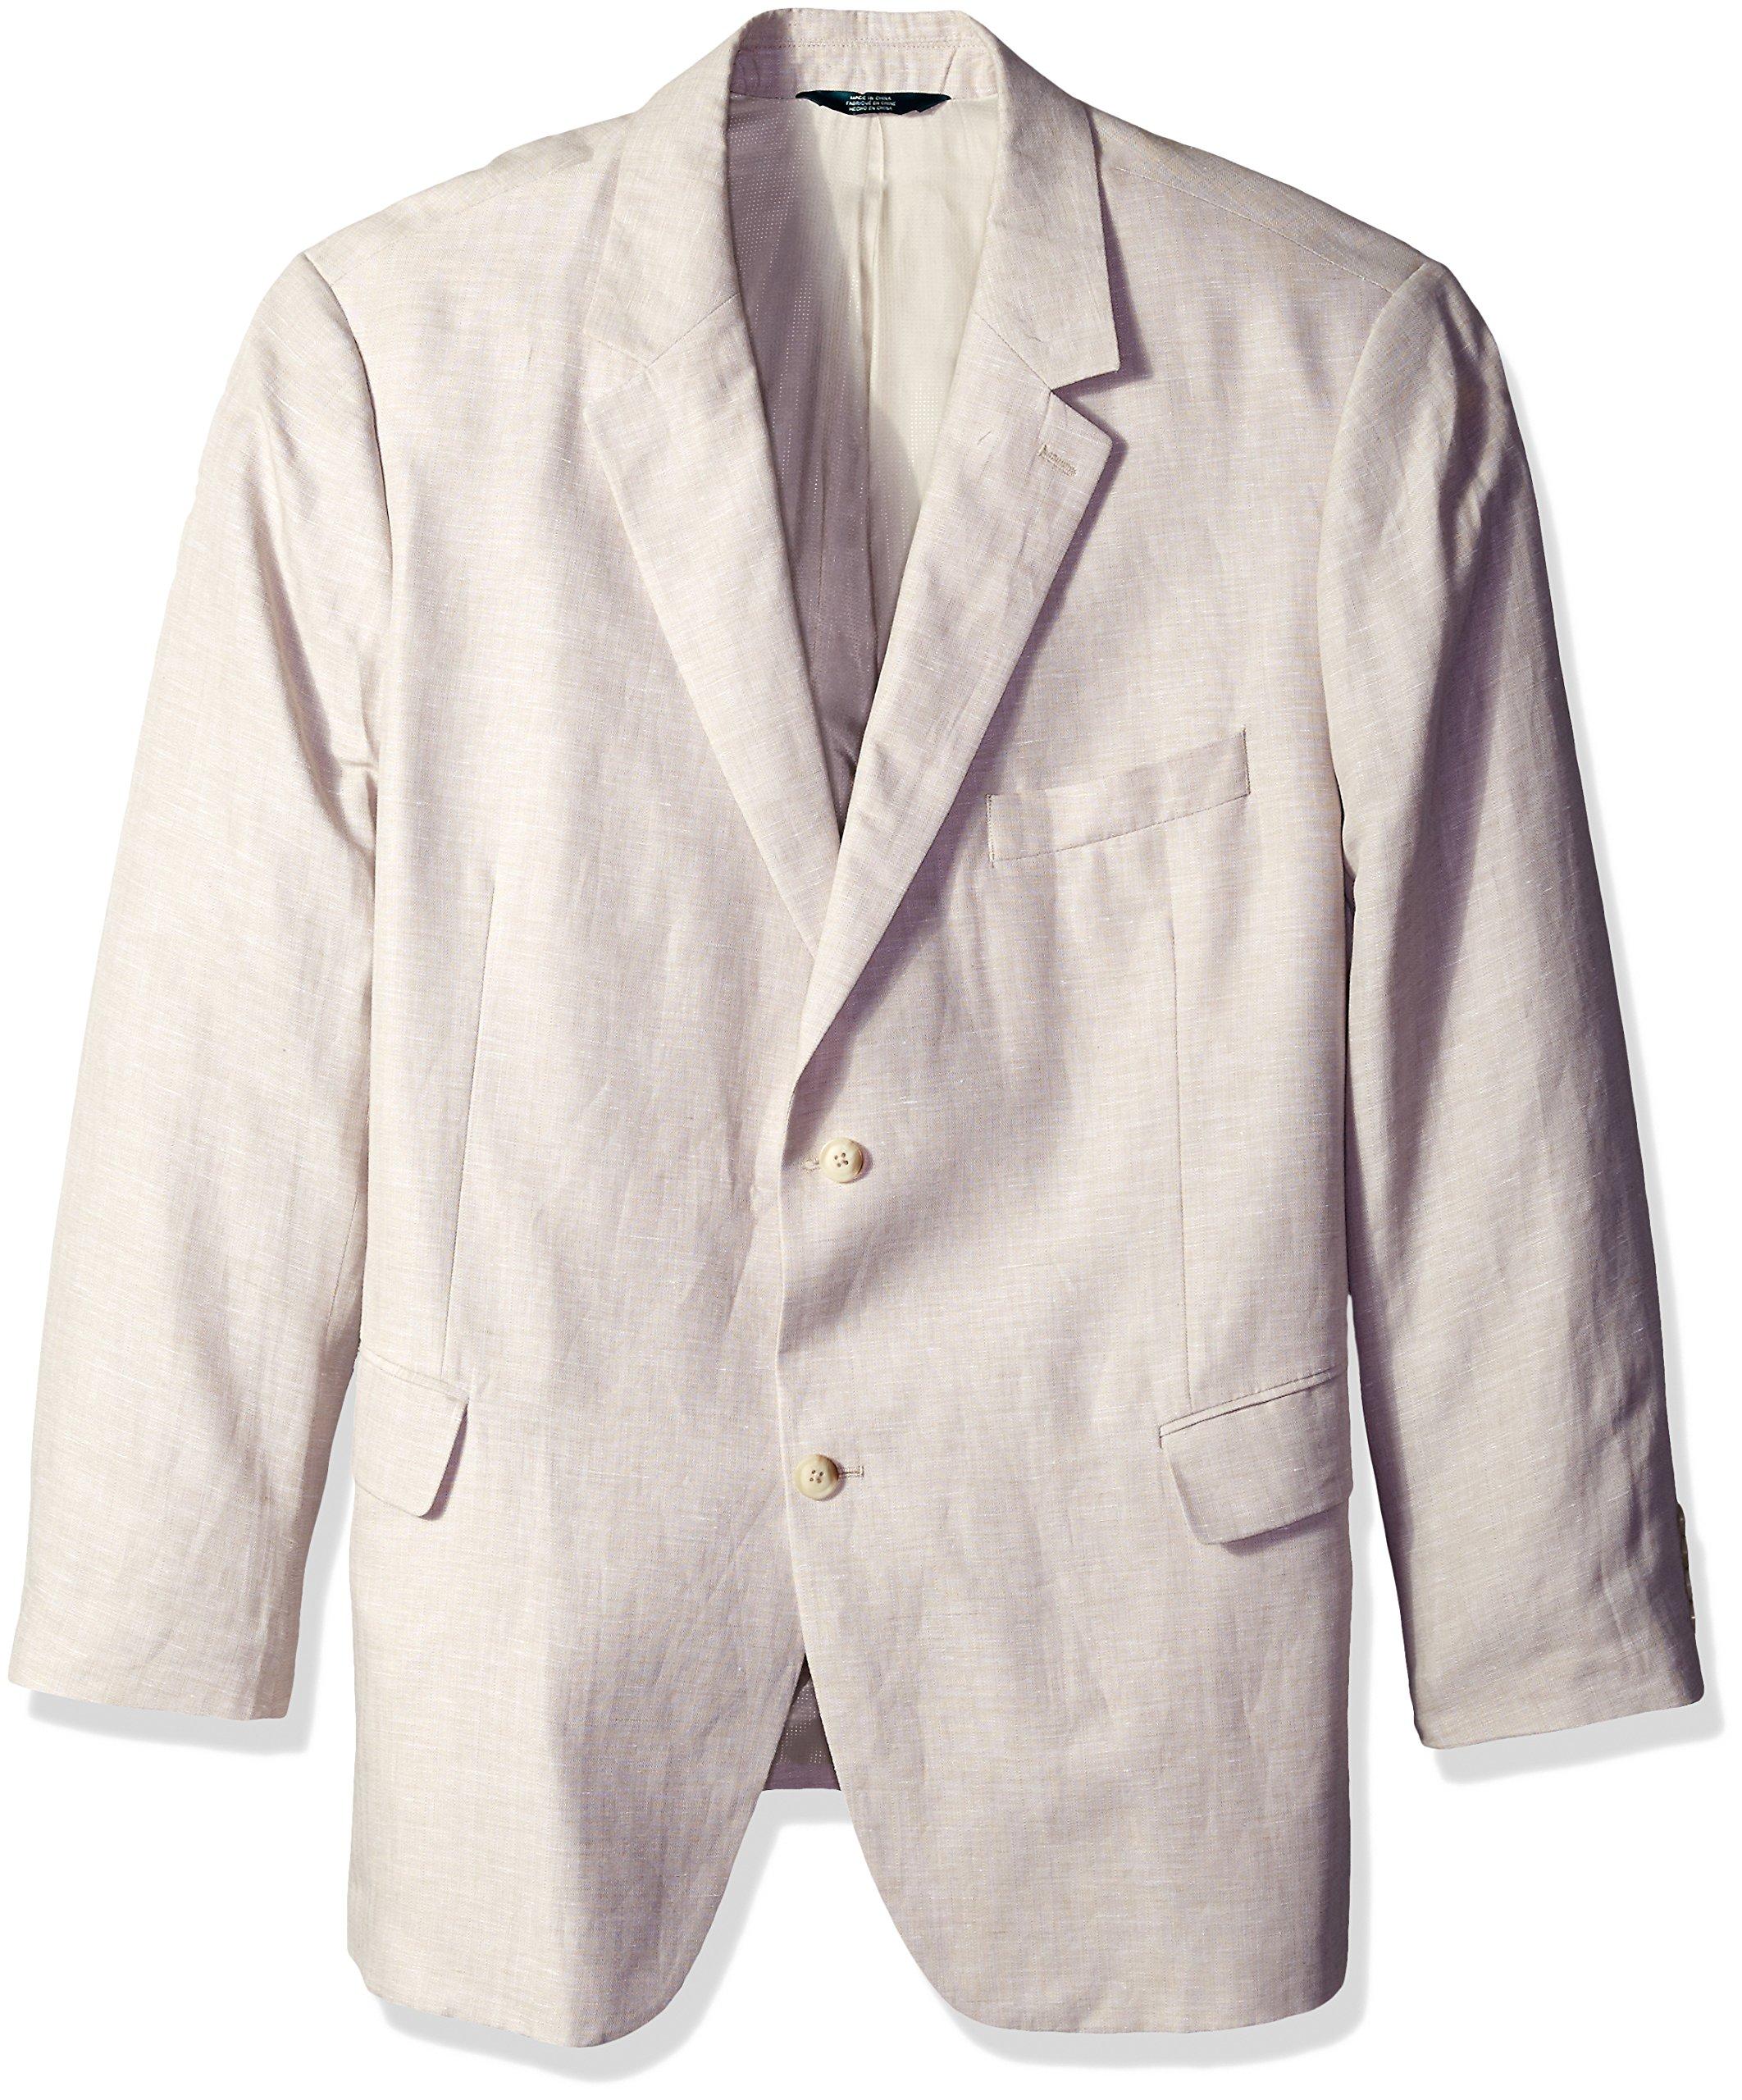 Perry Ellis Men's Big and Tall Linen Two-Button Notch Lapel Jacket, Natural Linen, 50 Long